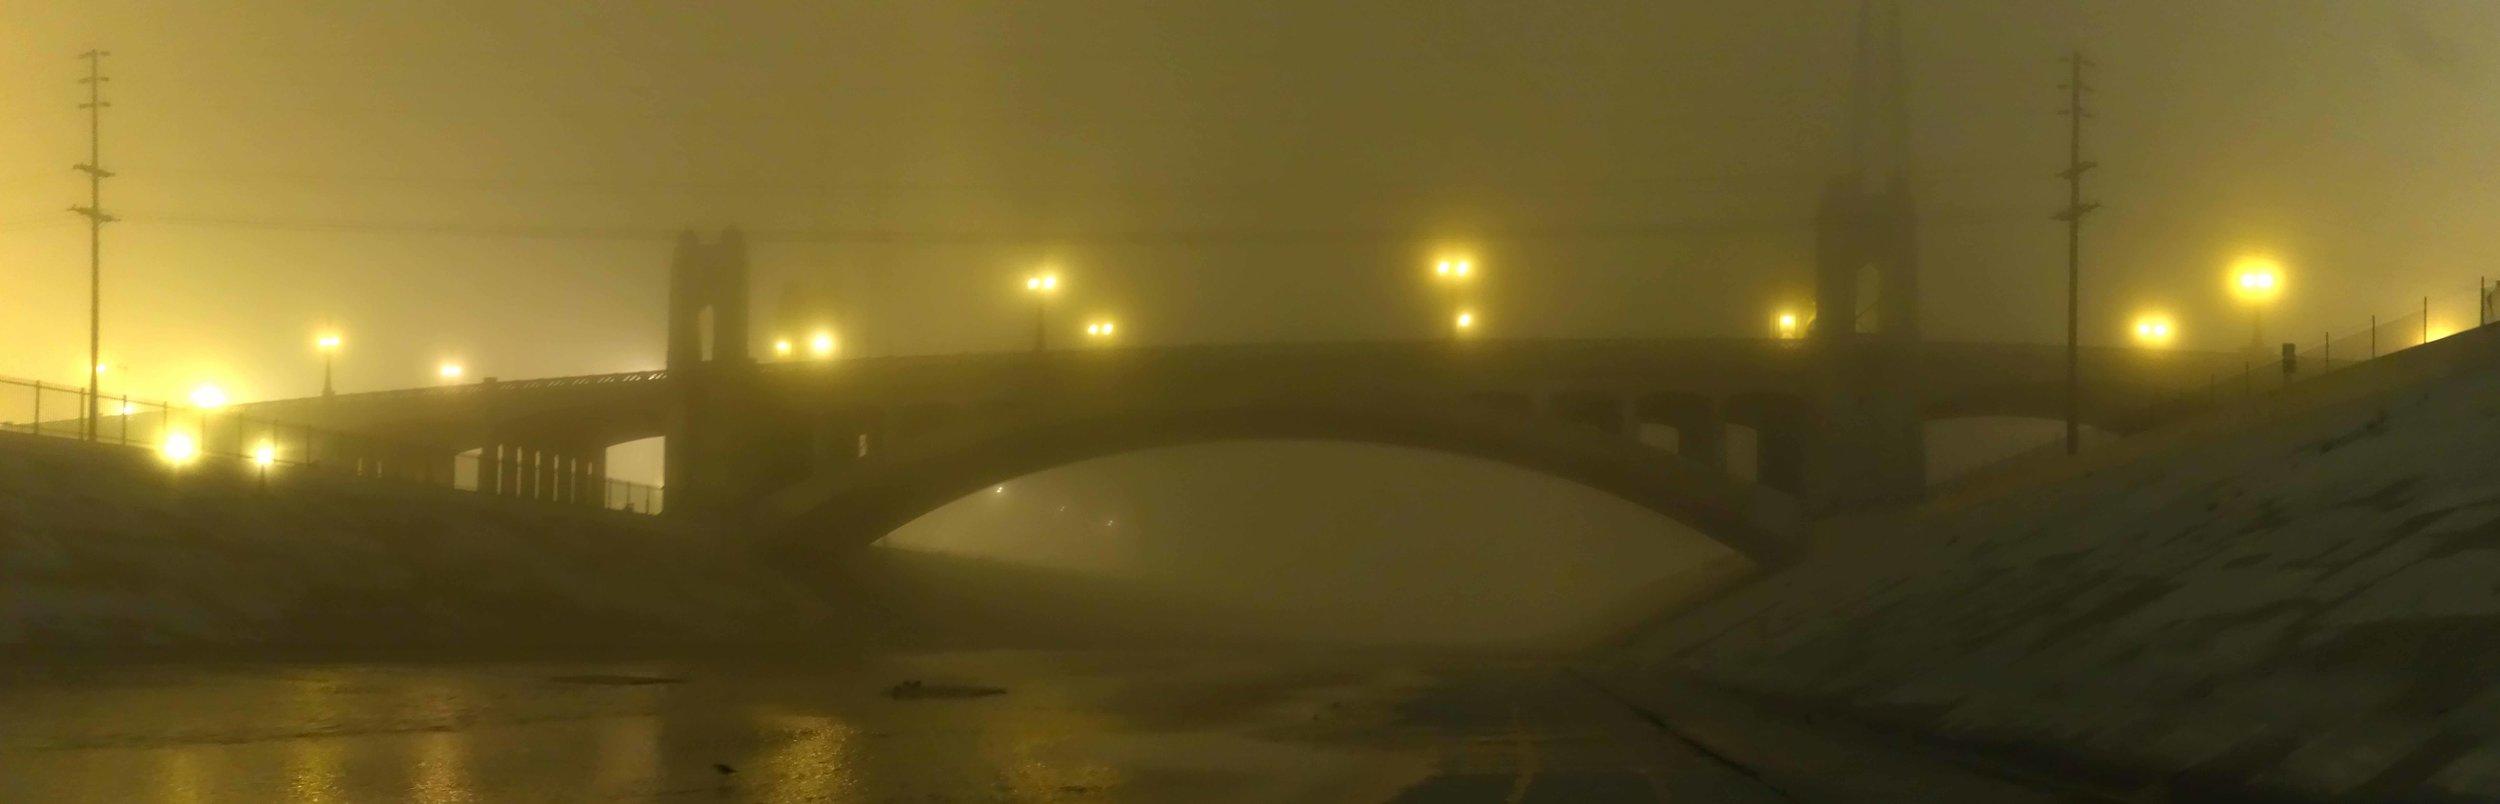 DSC03911_stitch.pan.4th.fog.bridge.CROP.jpg